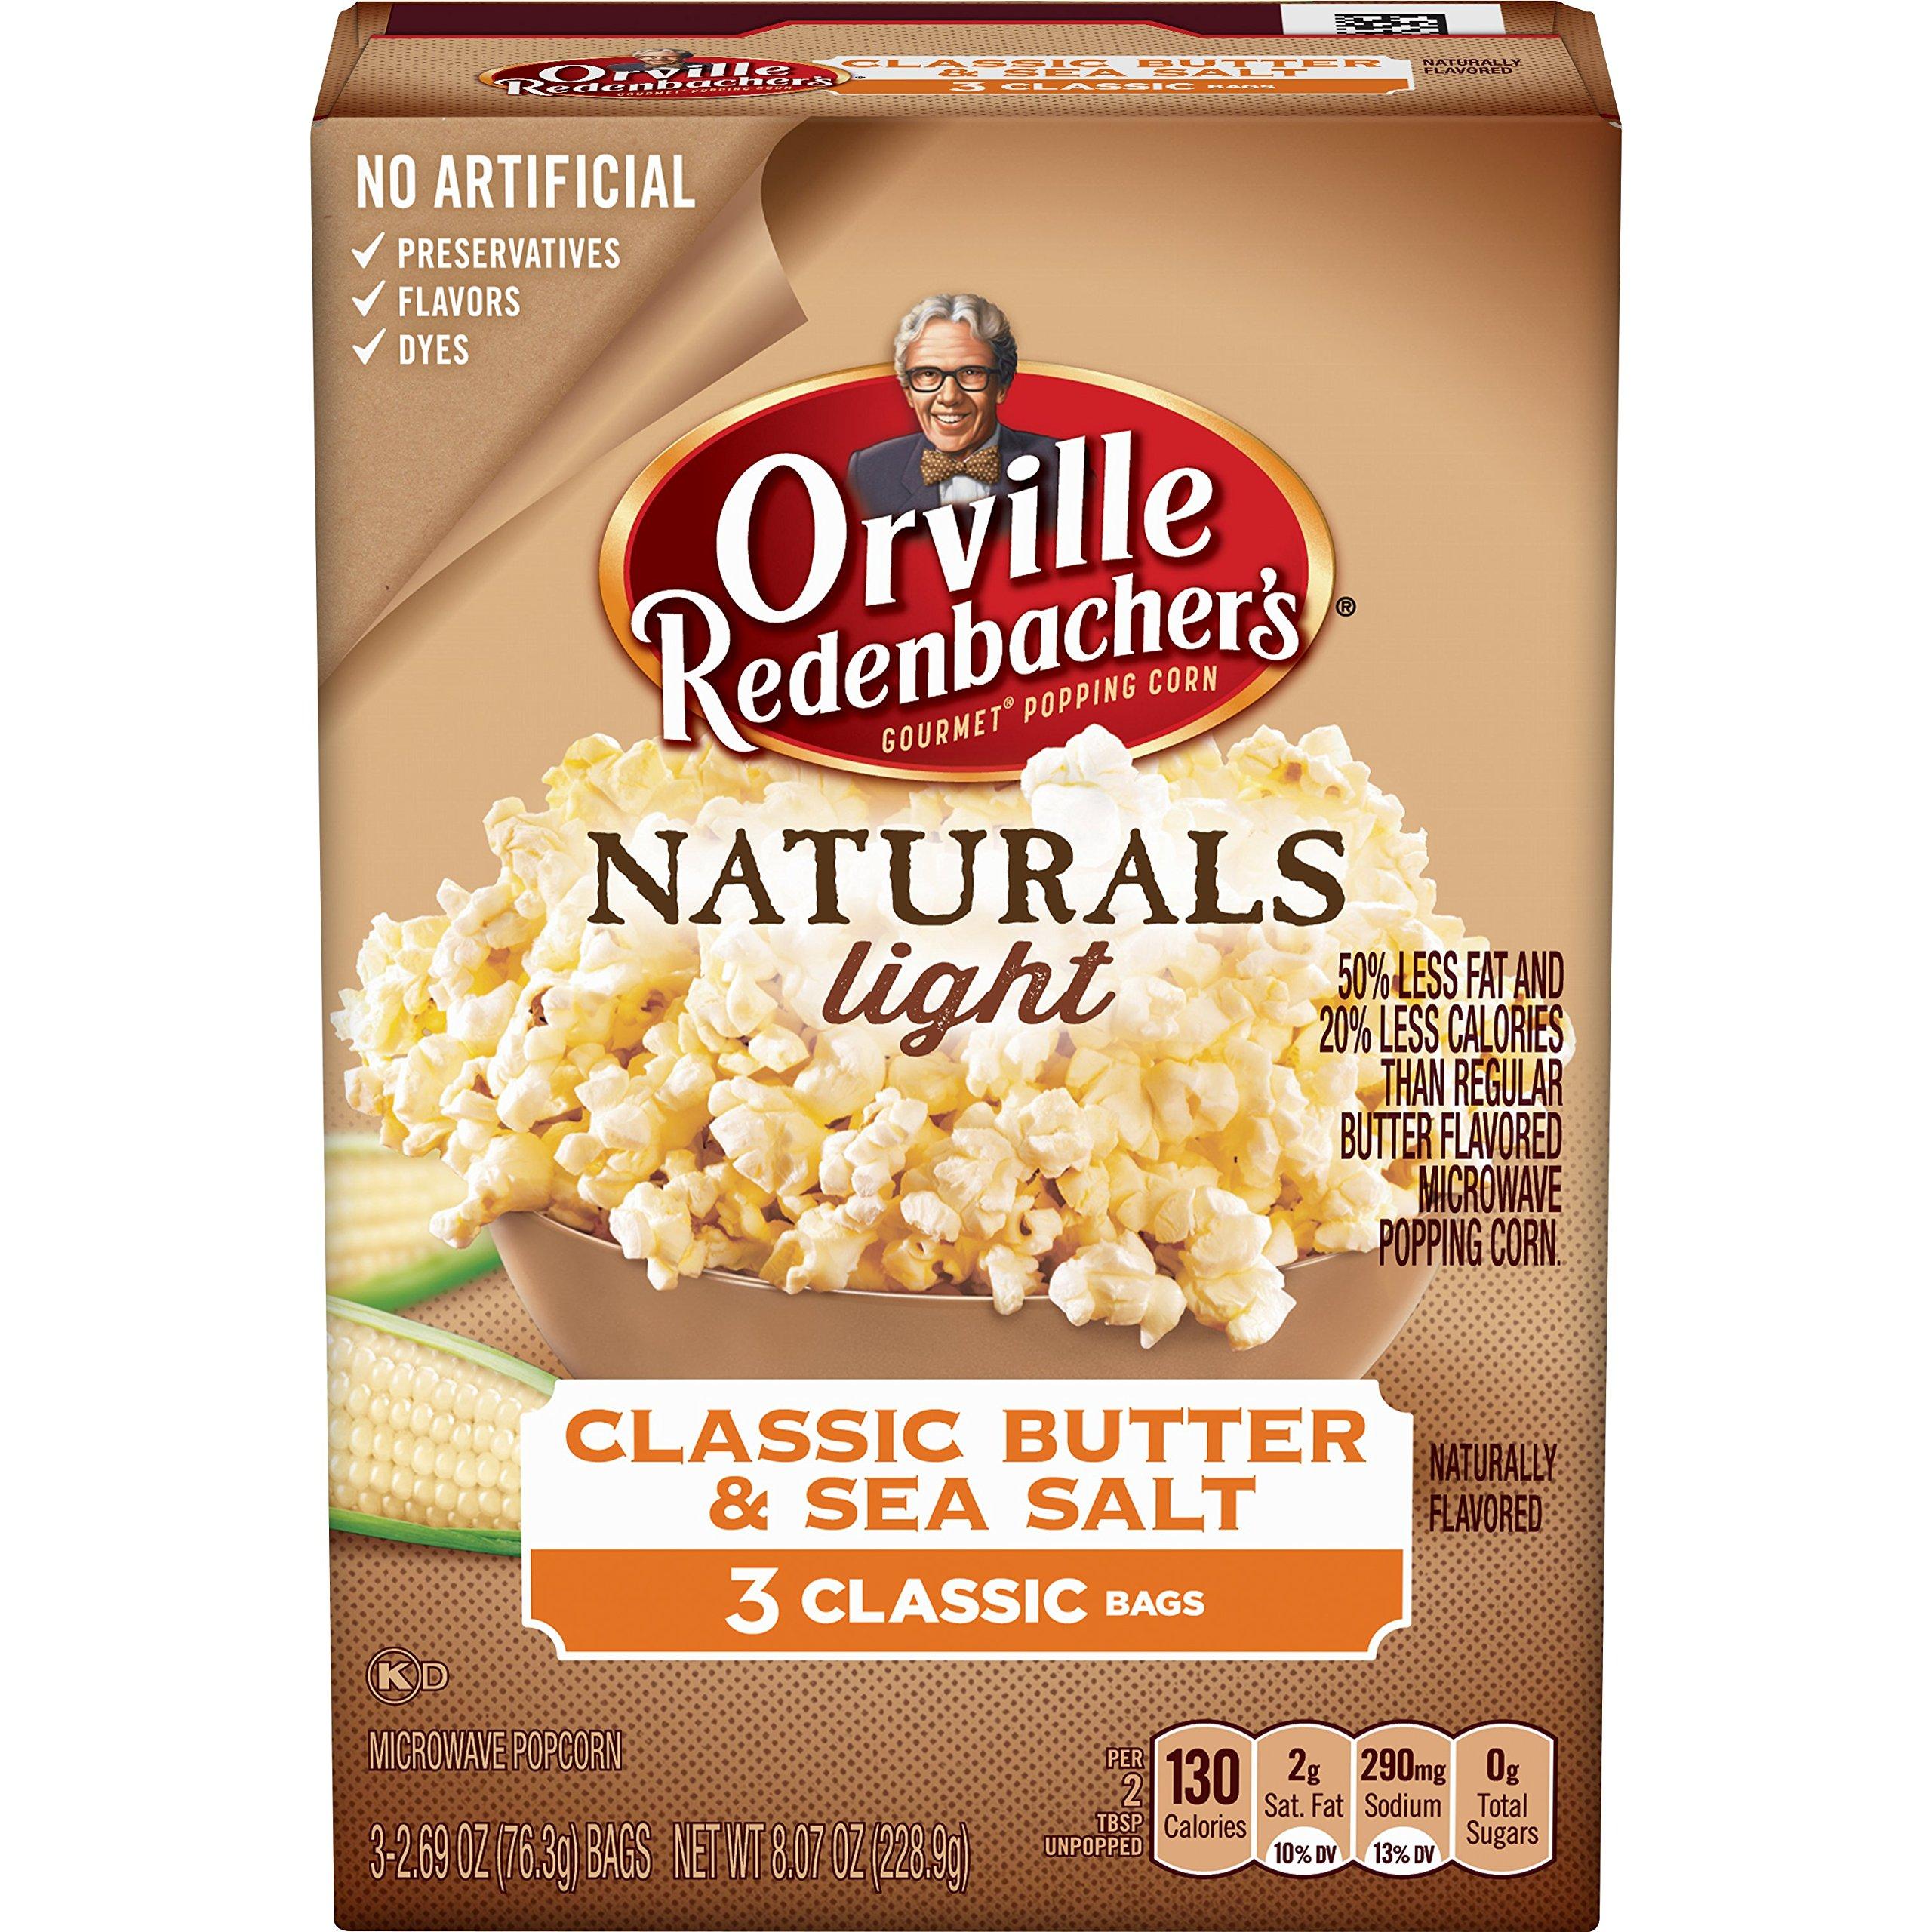 Orvile Redenbacher's Naturals Light Classic Butter & Sea Salt Popcorn, Classic Bag, 3 Count